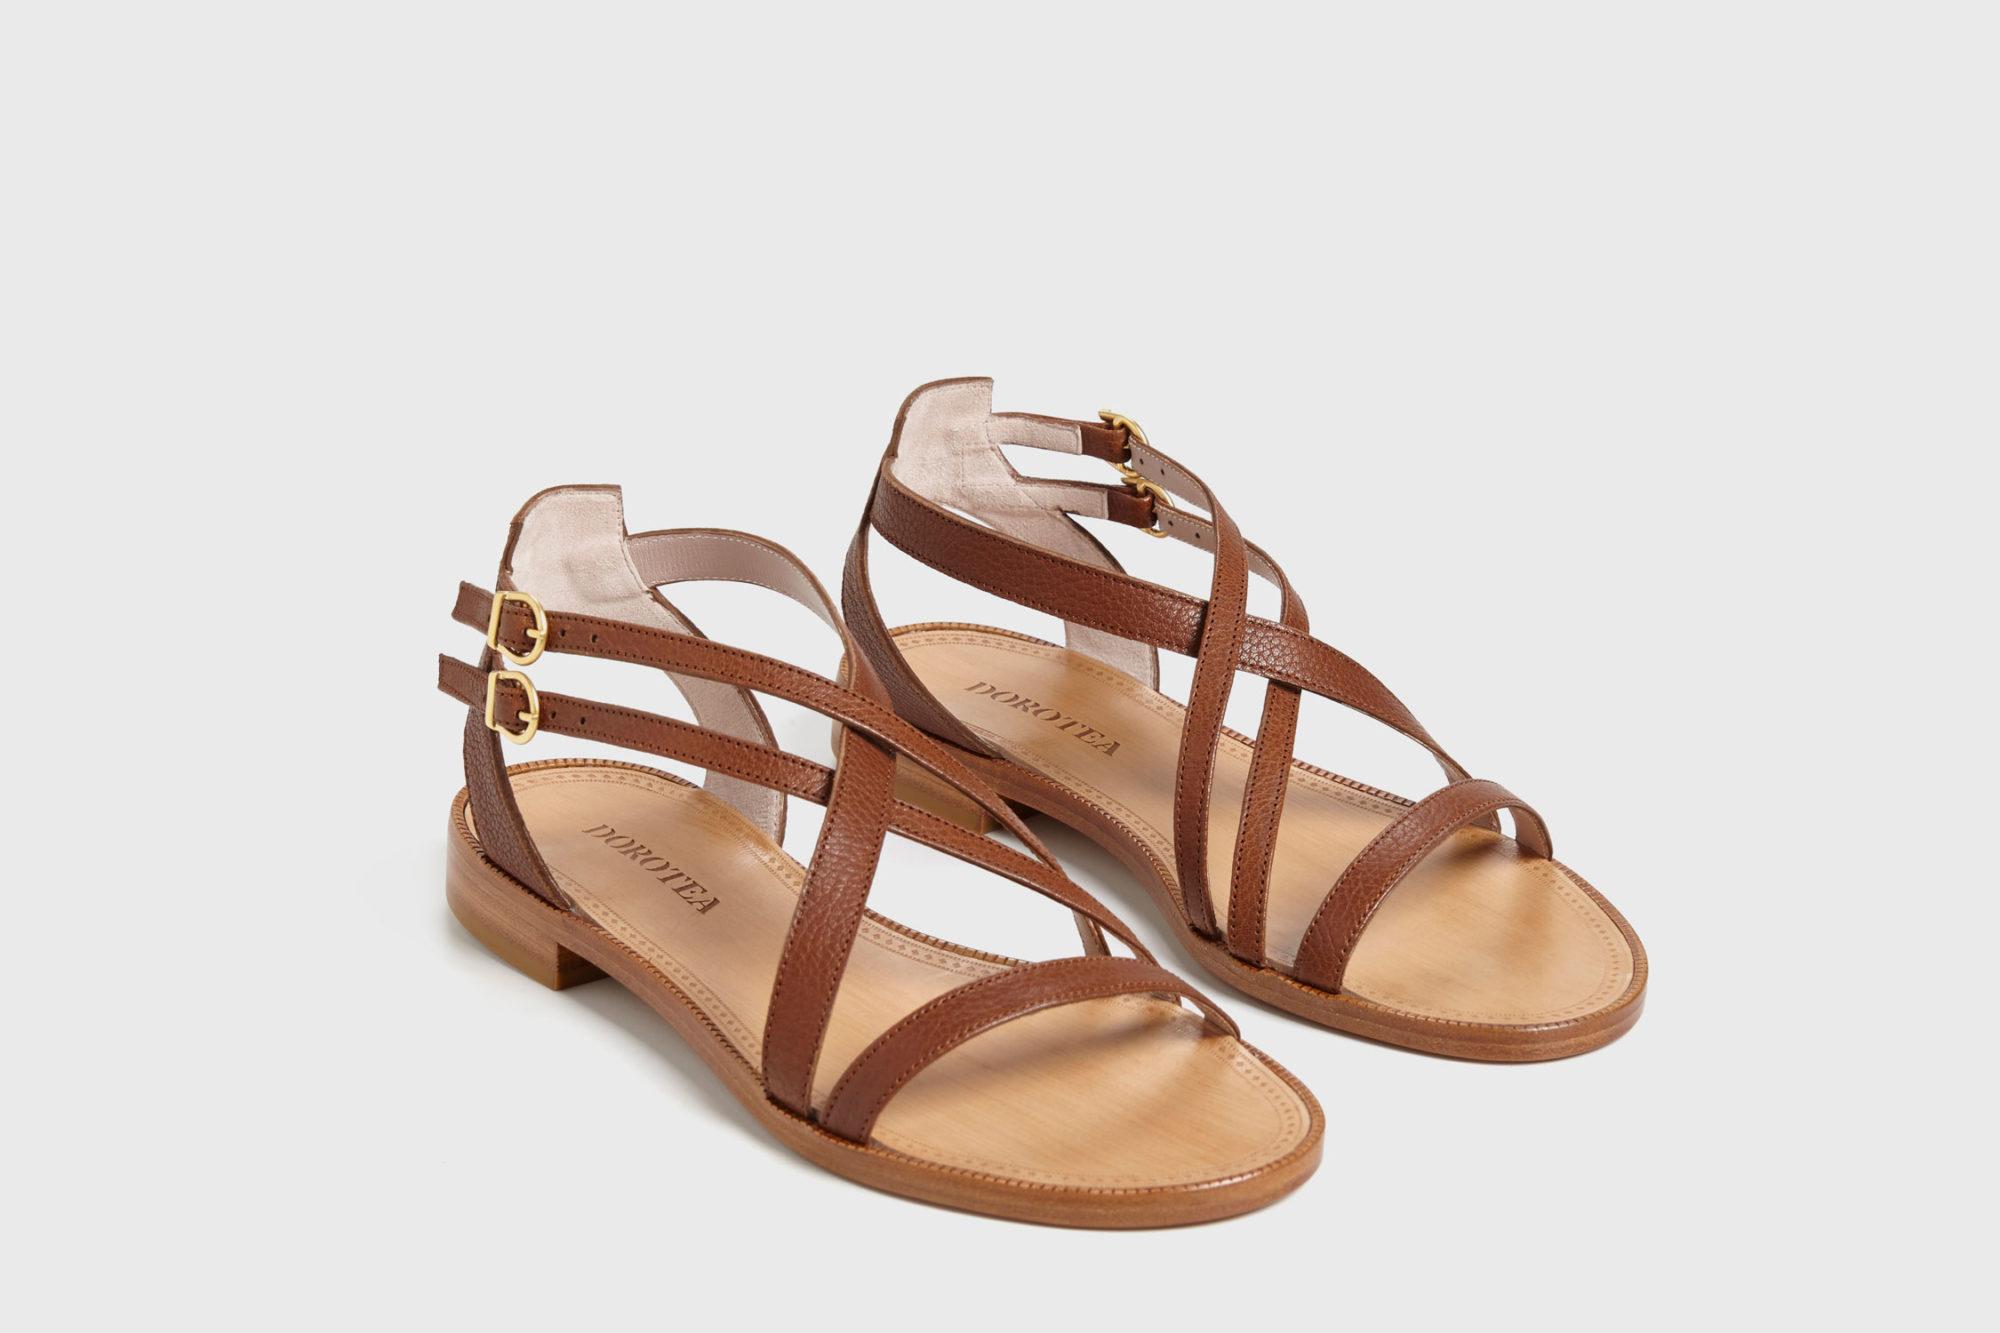 Dorotea sandalia plana Charlotte marrón ss17 par